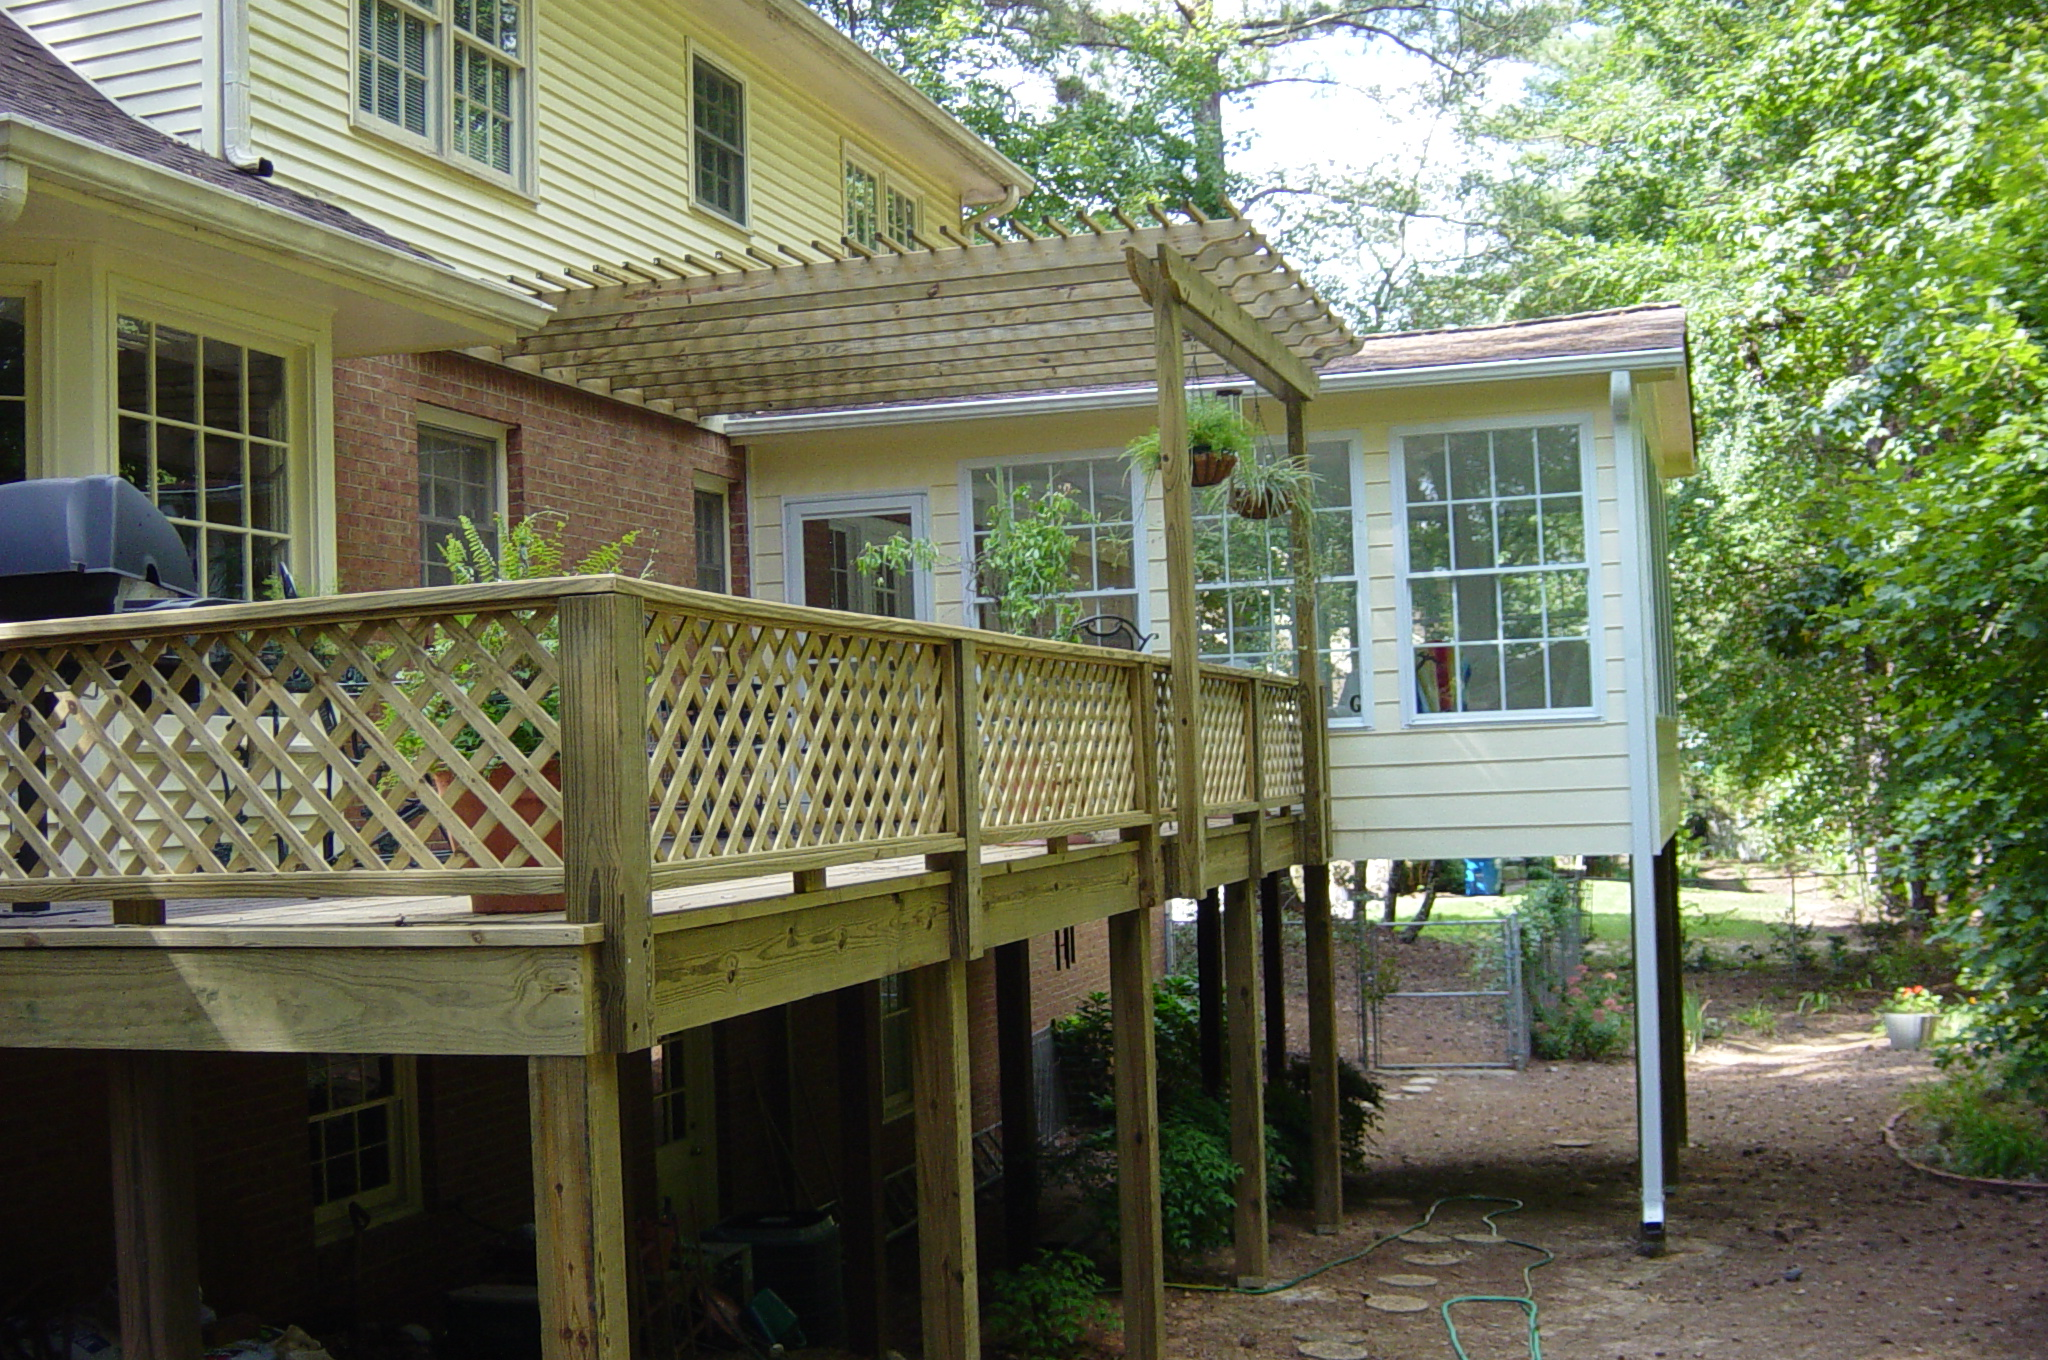 sunroom_pine deck with pergola and lattice.jpg